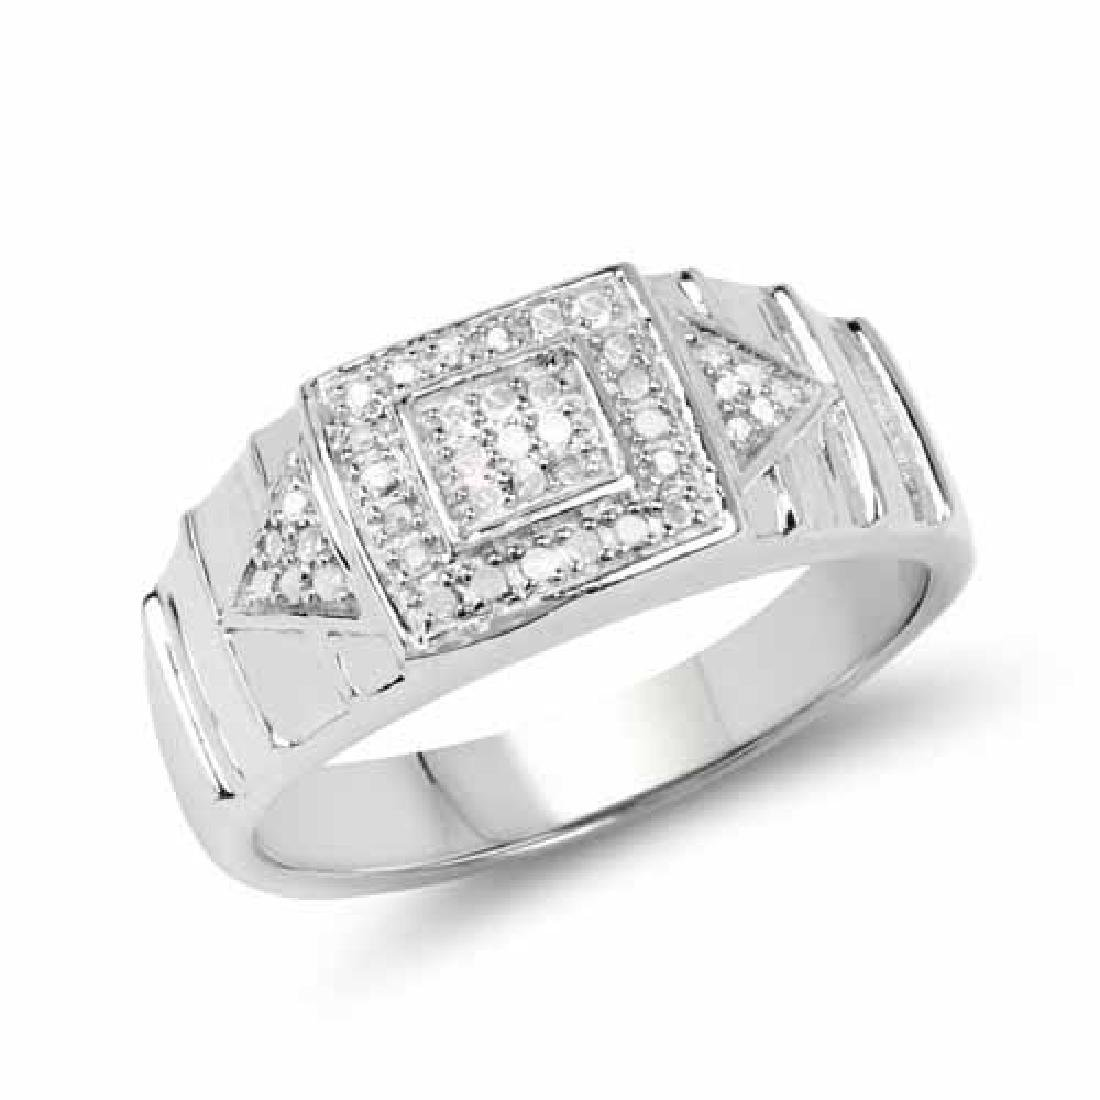 14K White Gold Plated 0.21 Carat Genuine White Diamond